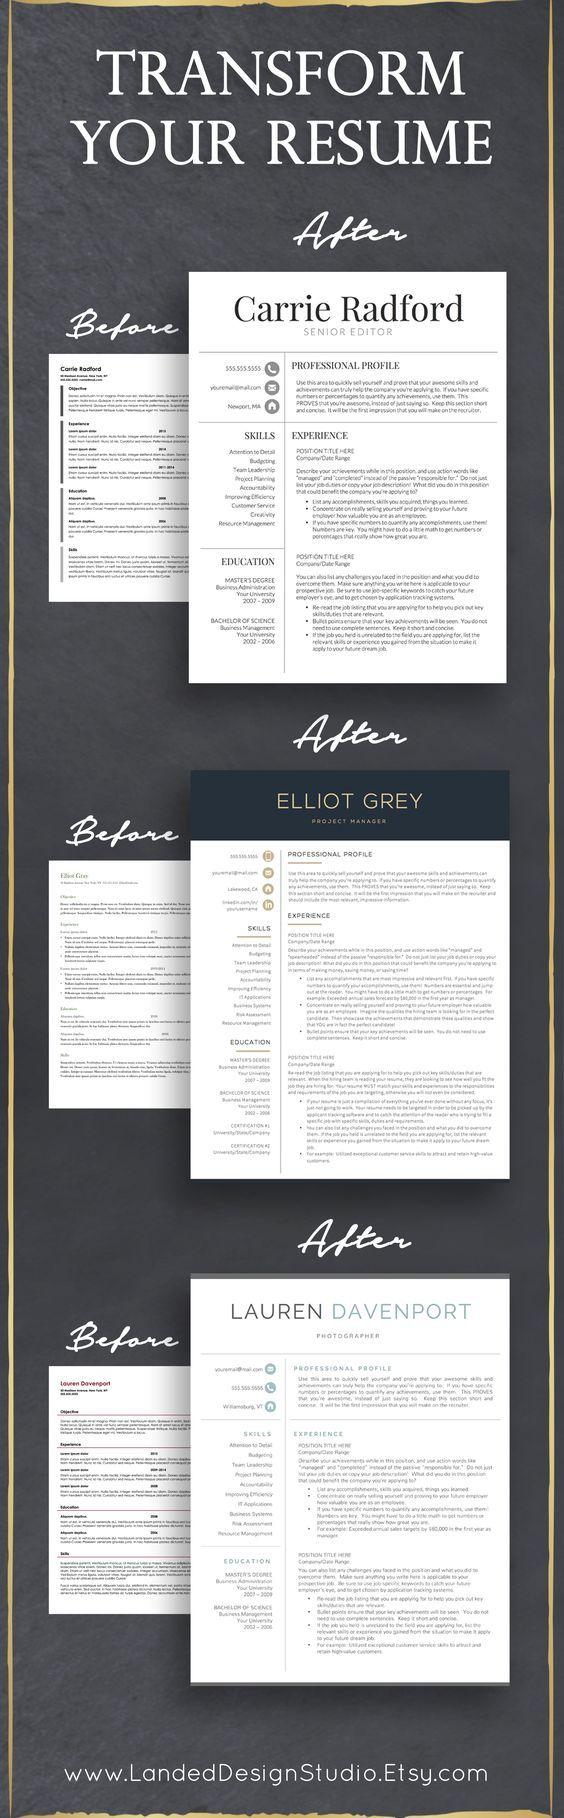 receptionist resume sample%0A Receptionist resume